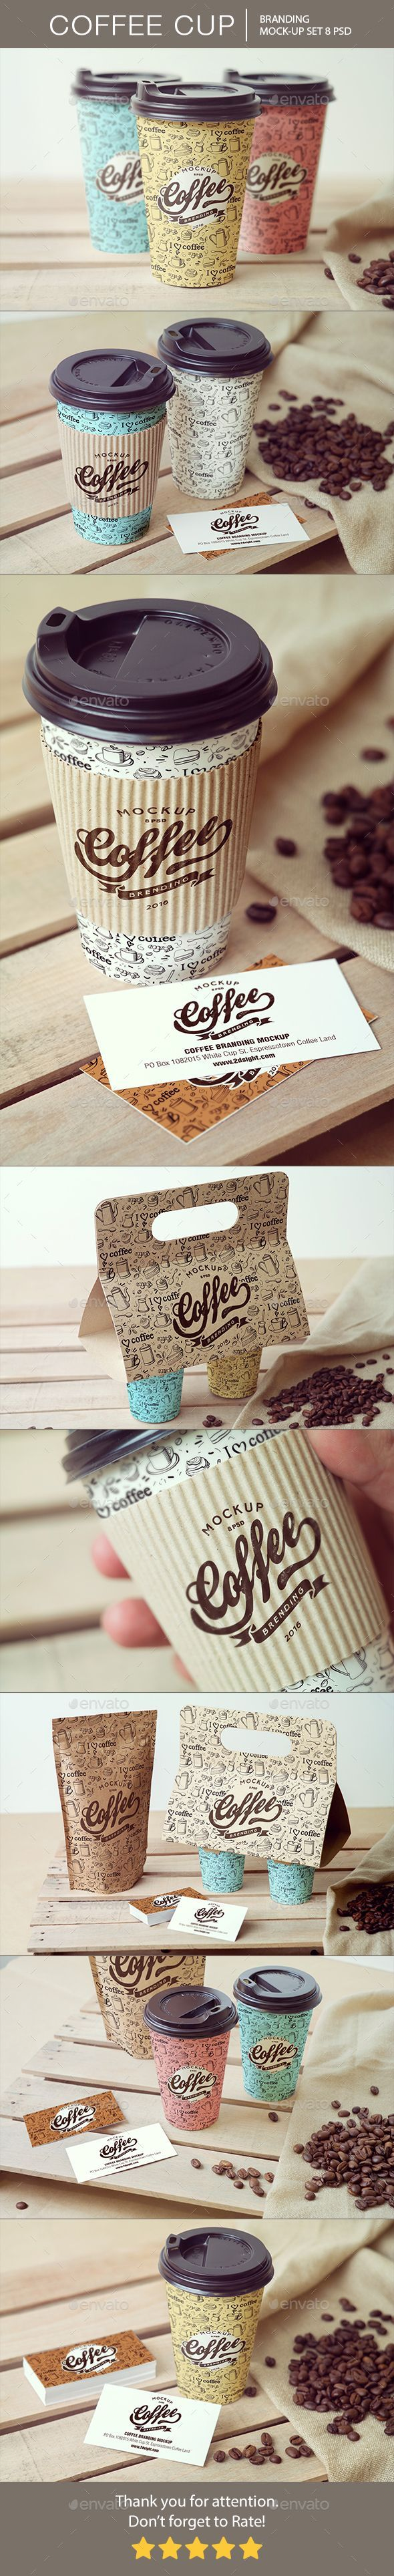 Pin by Chirag Rawat on tnj ideas Coffee shop logo